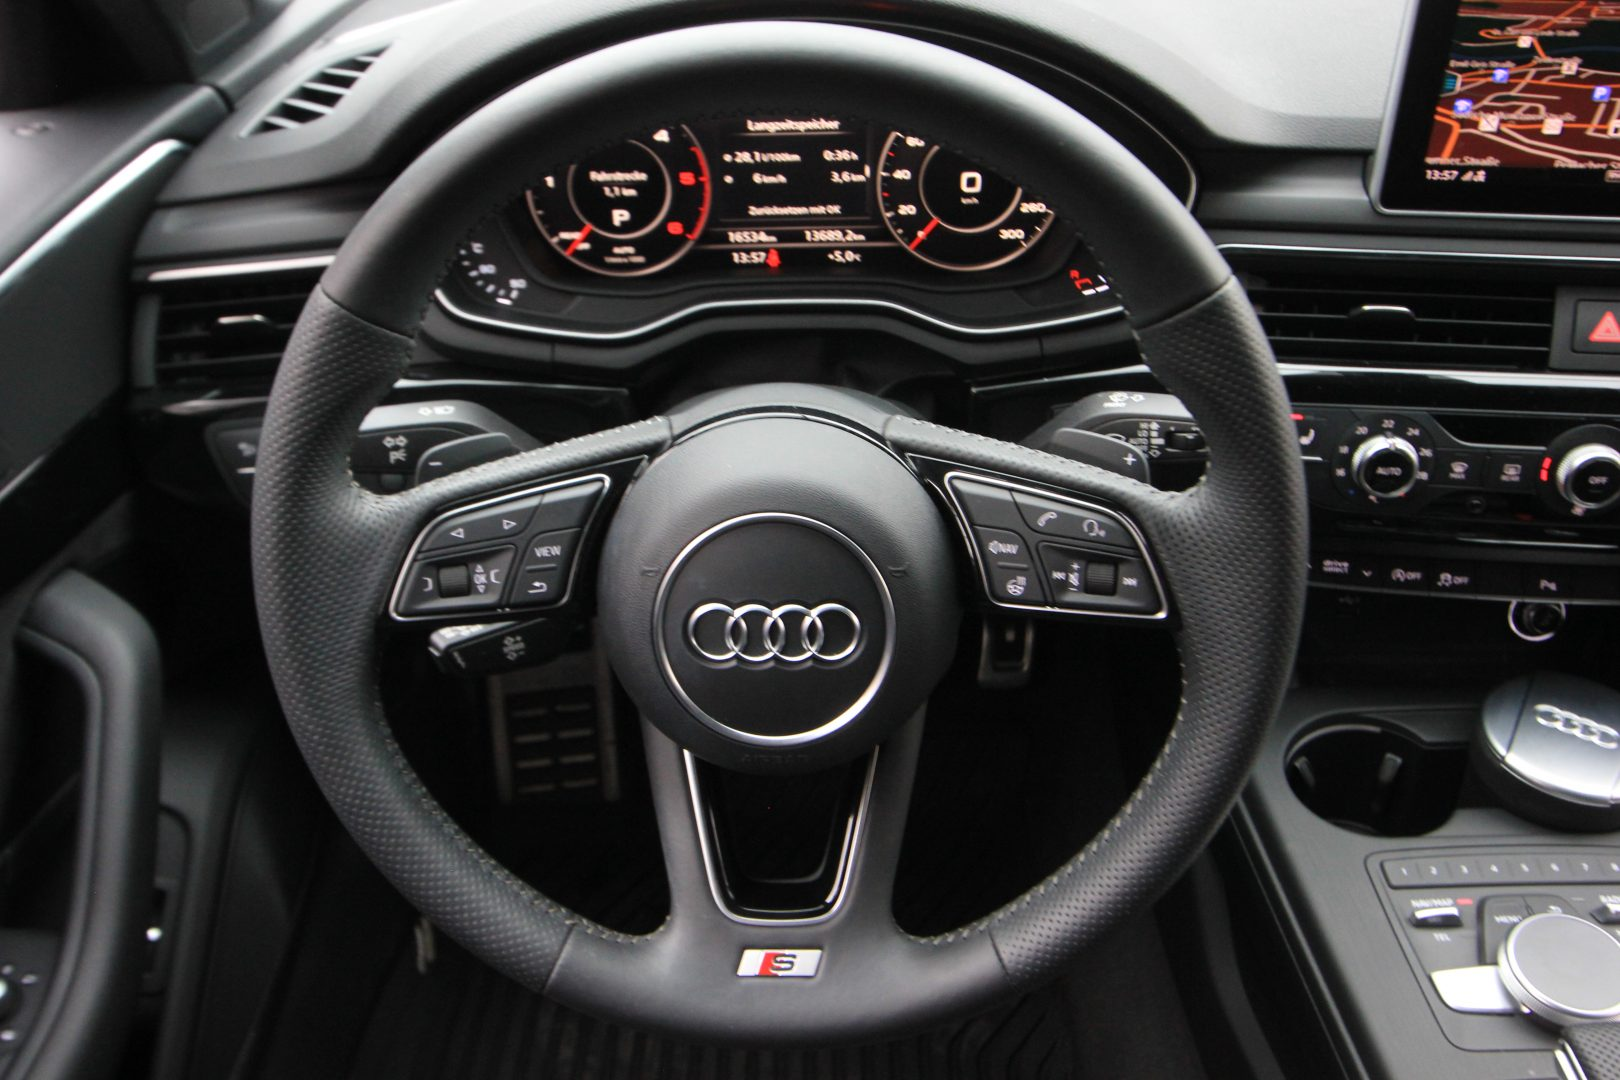 AIL Audi A4 Avant S line Sport / Plus quattro 3.0 TDI 5